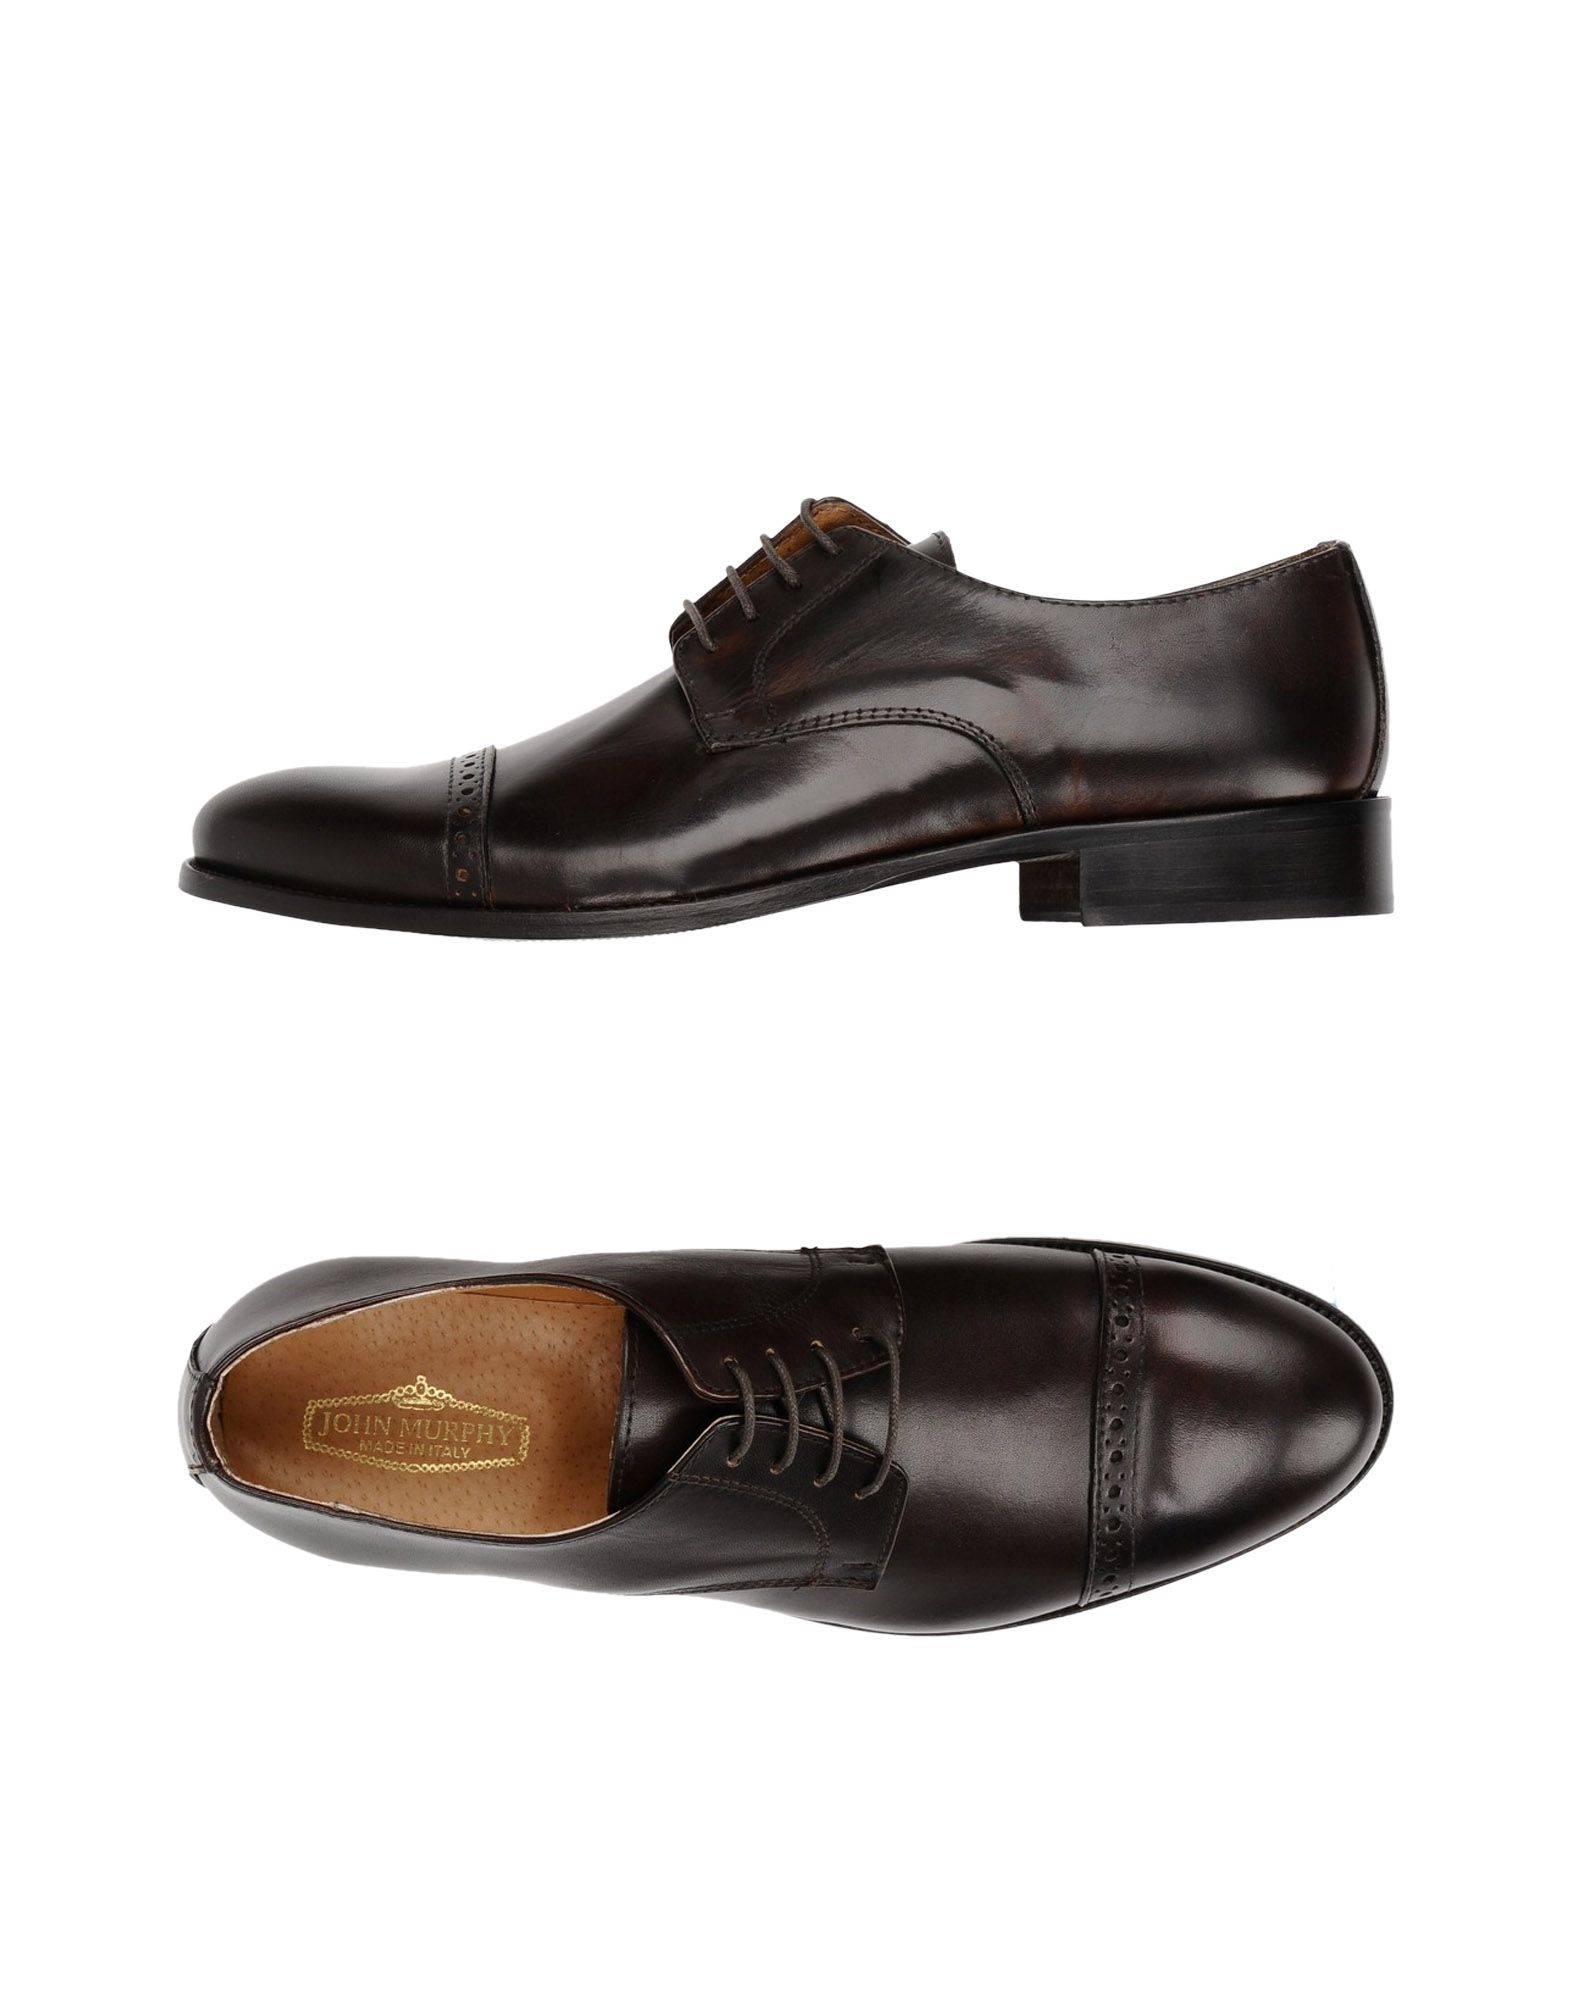 Rabatt echte Schuhe John Murphy Schnürschuhe Herren  11416127DF